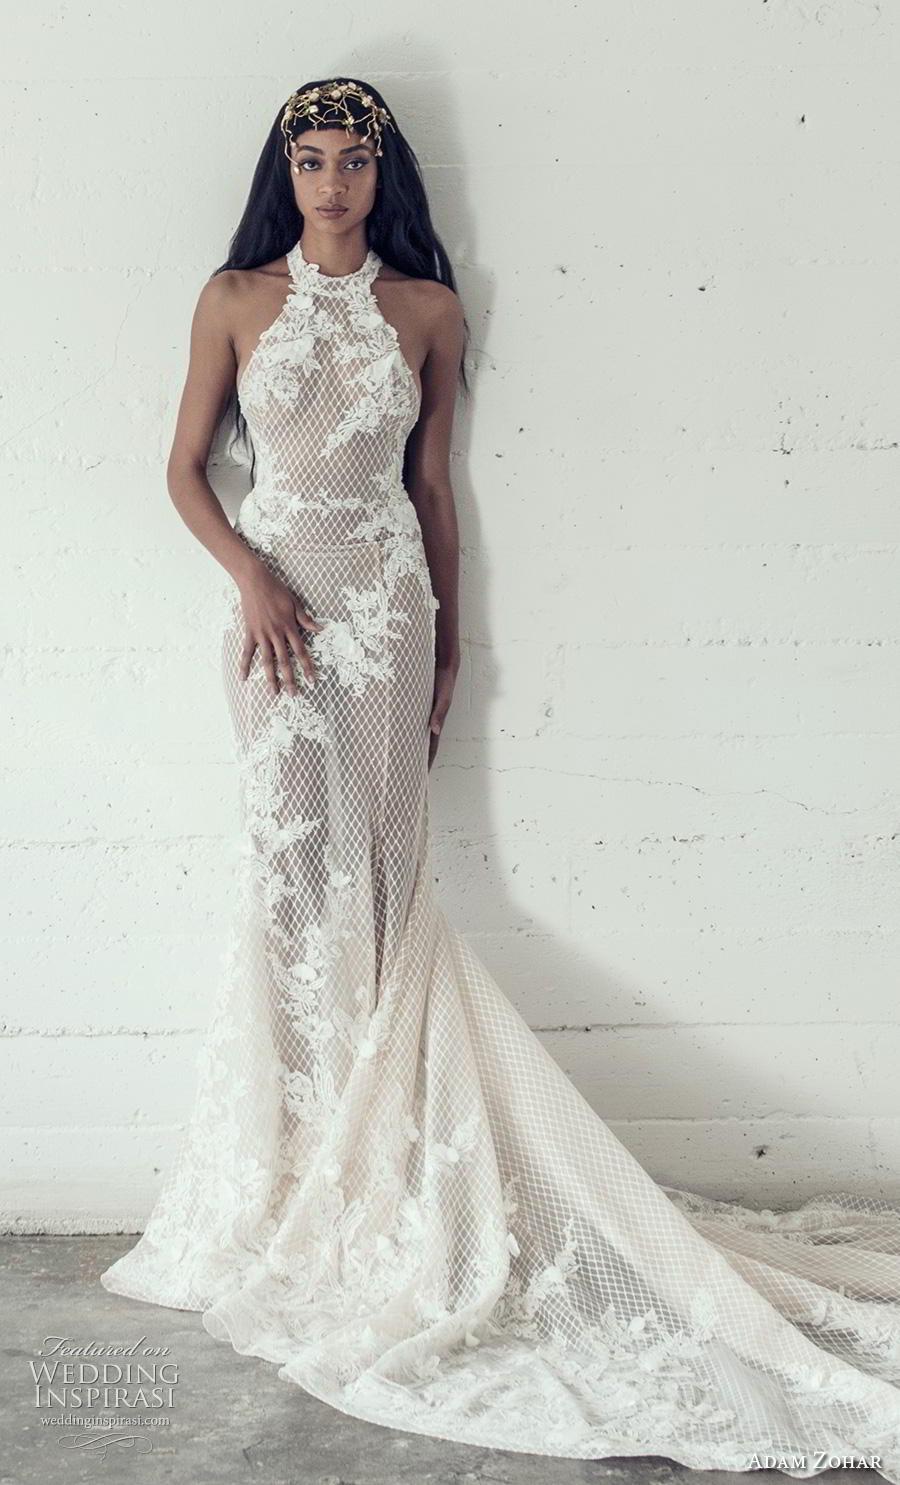 adam zohar 2019 bridal sleeveless halter neck full embellishment elegant sheath wedding dress backless chapel train (15) mv